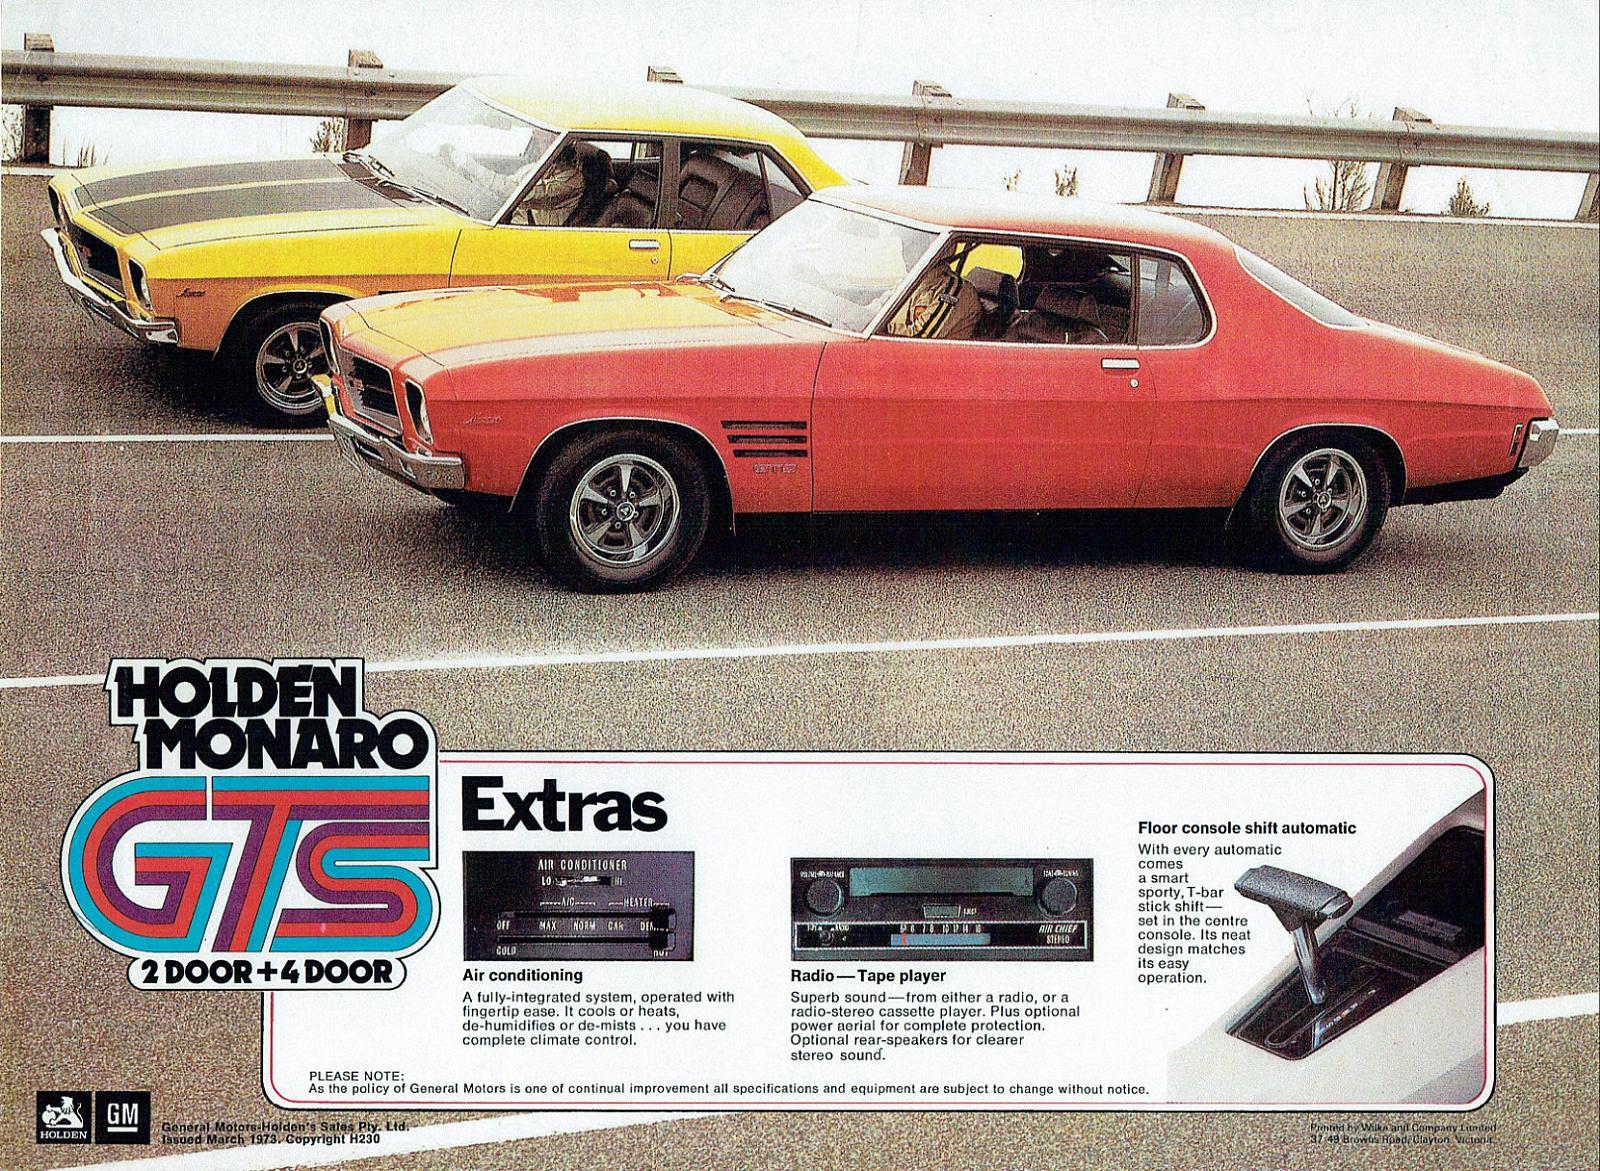 1972 HQ Monaro GTS coupe and sedan